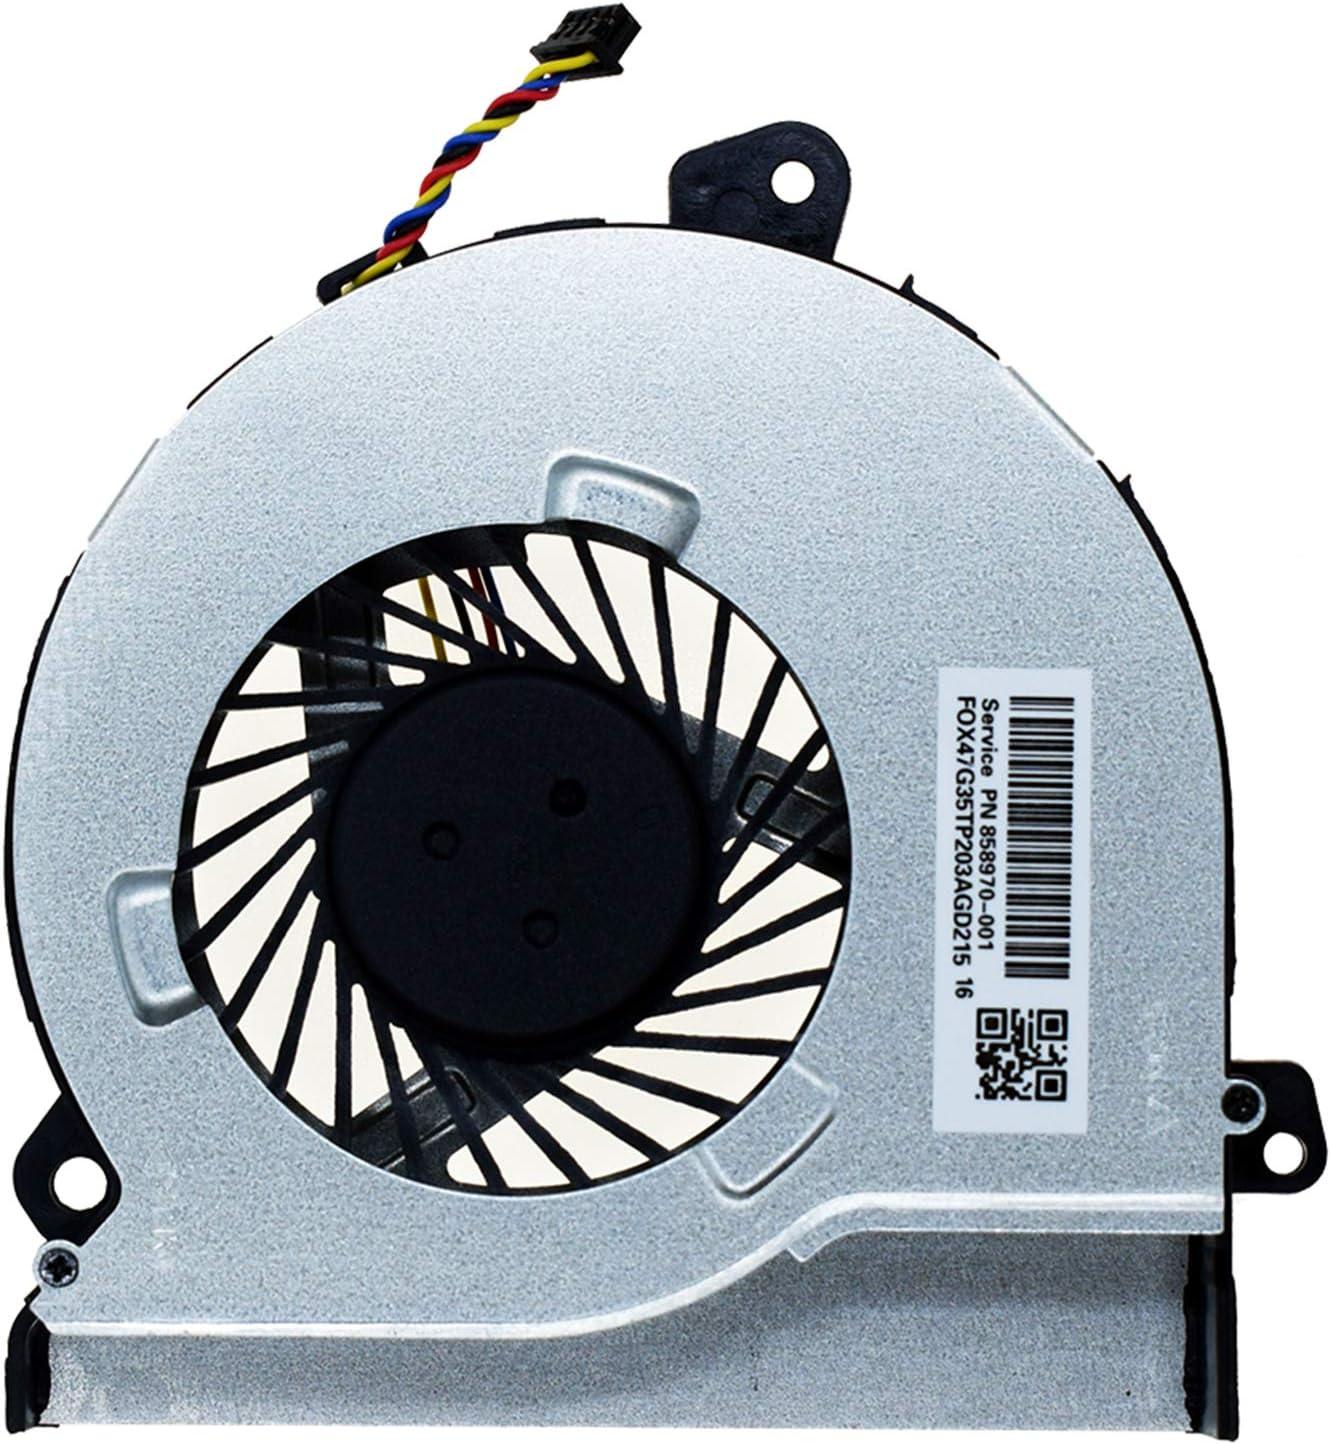 DREZUR CPU Cooling Fan Outlet SALE for H Pavilion Inventory cleanup selling sale Laptop 15-AK Cooler Series